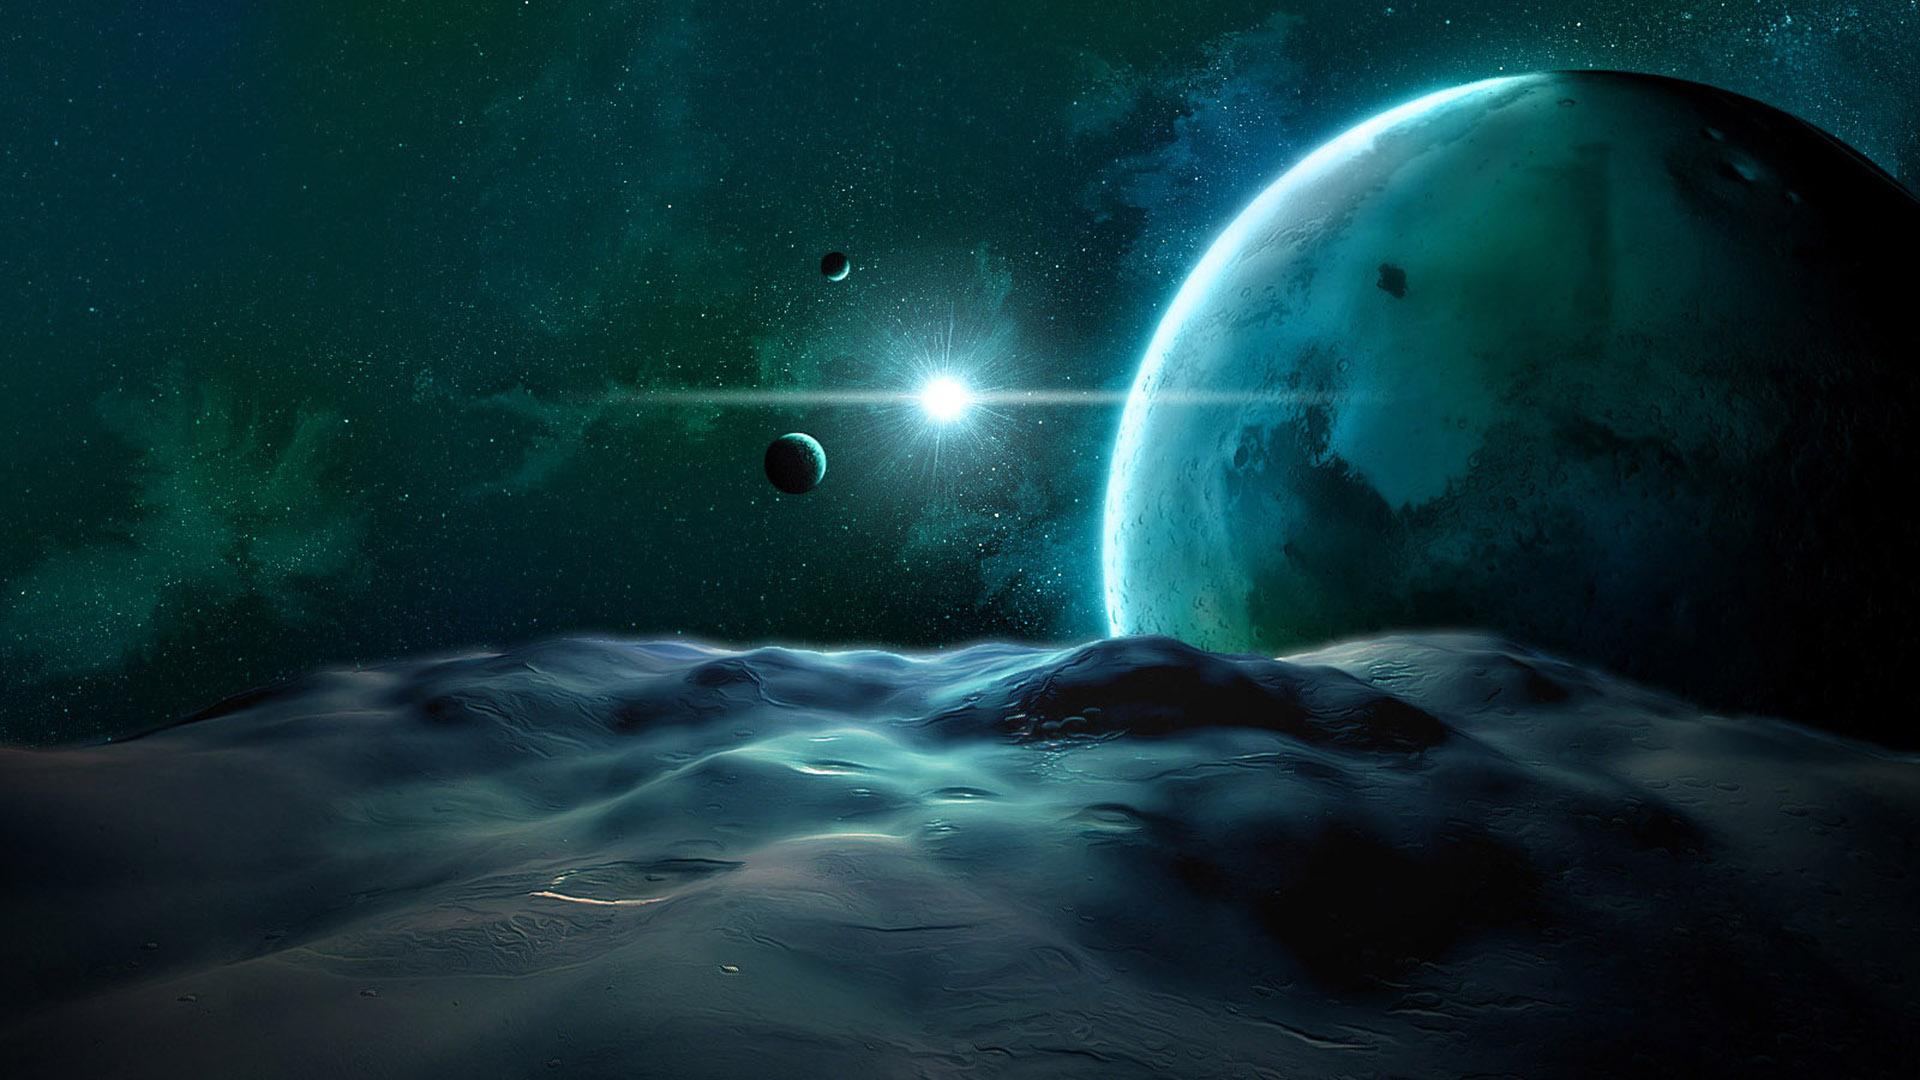 Fantasy Planet wallpaper 16325 1920x1080